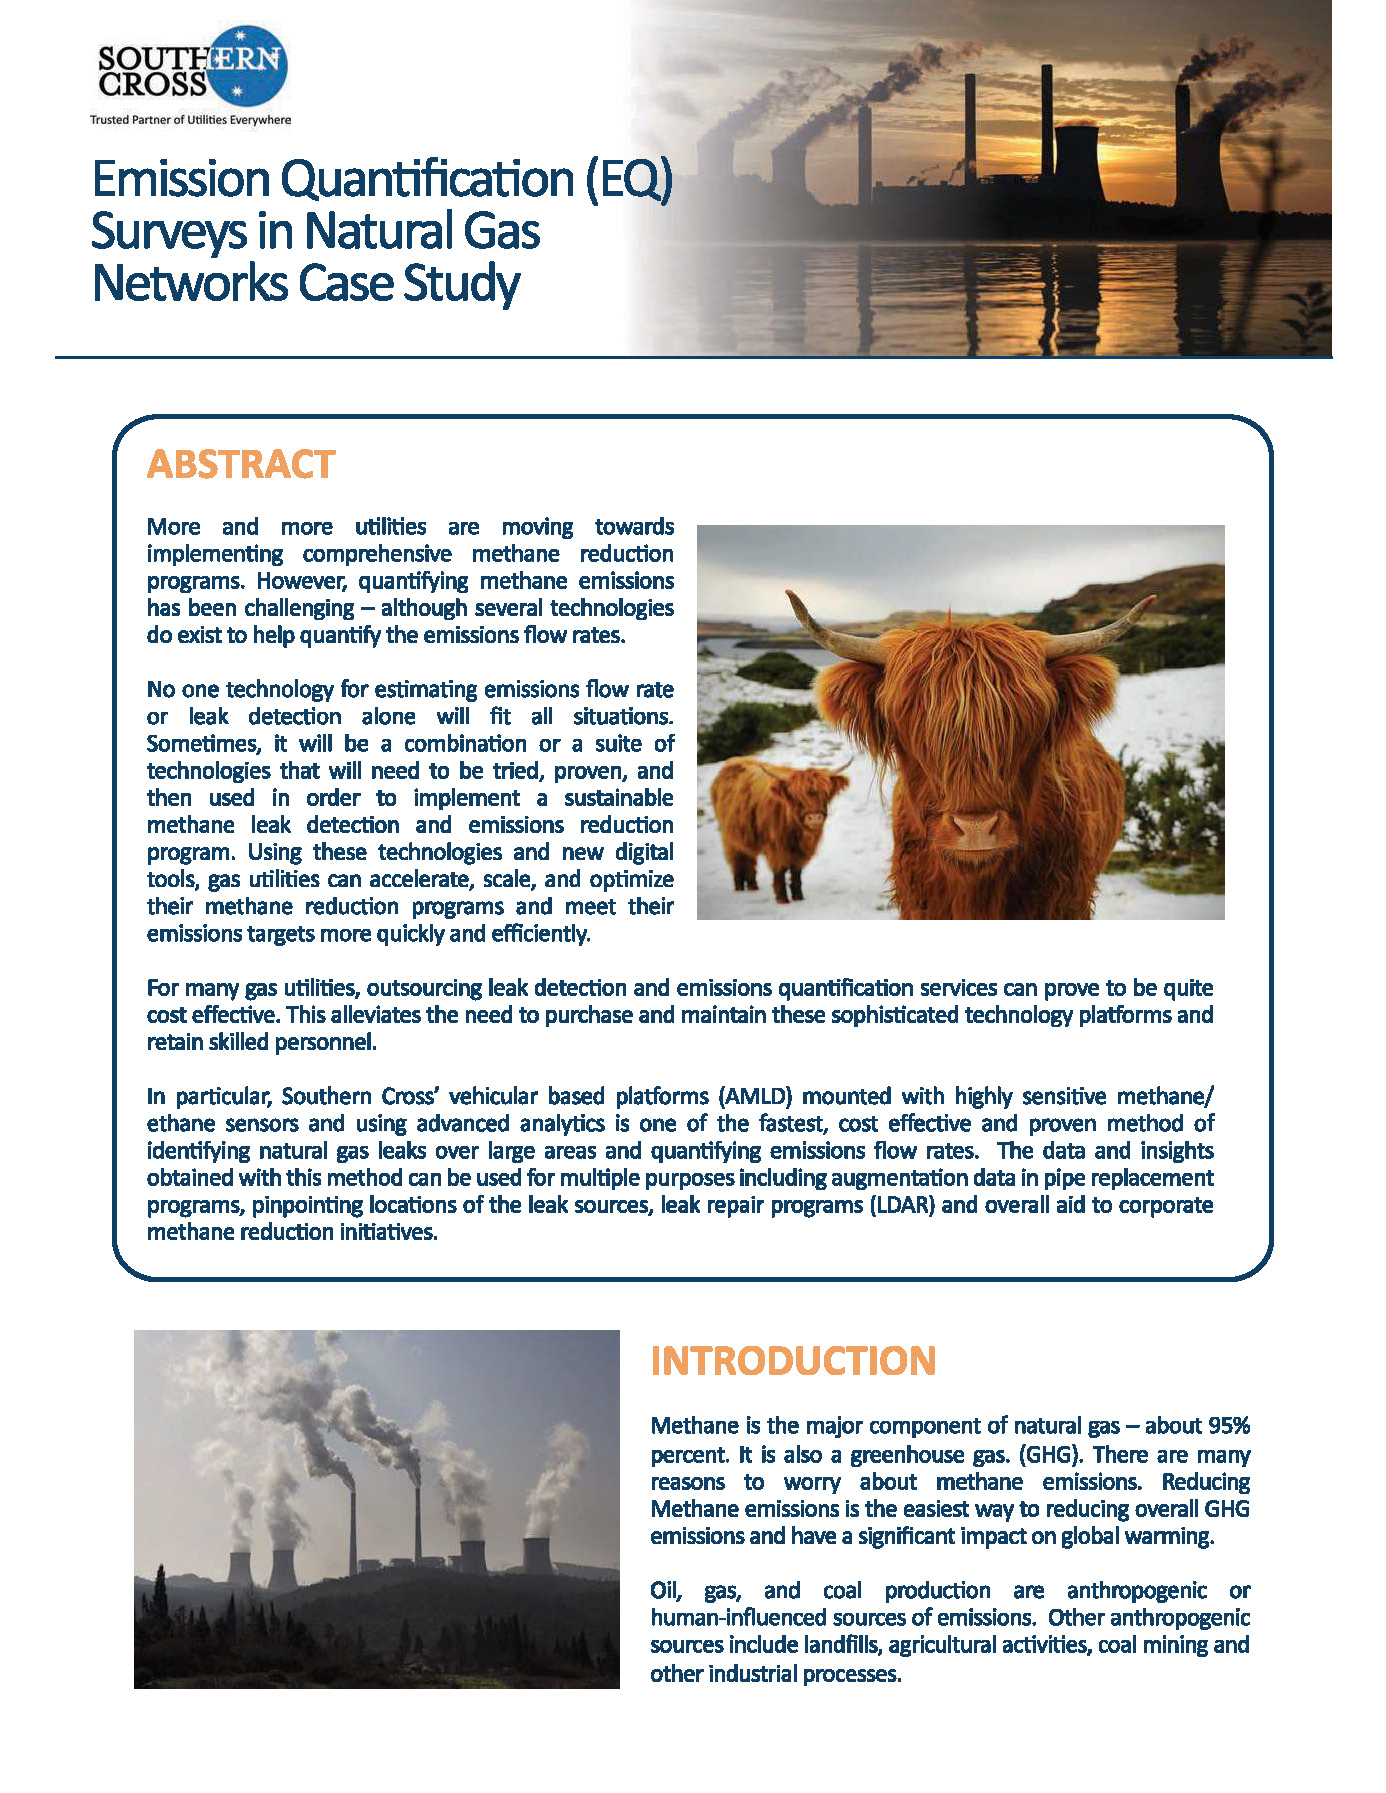 Emissions Quantification White Paper_Page_1